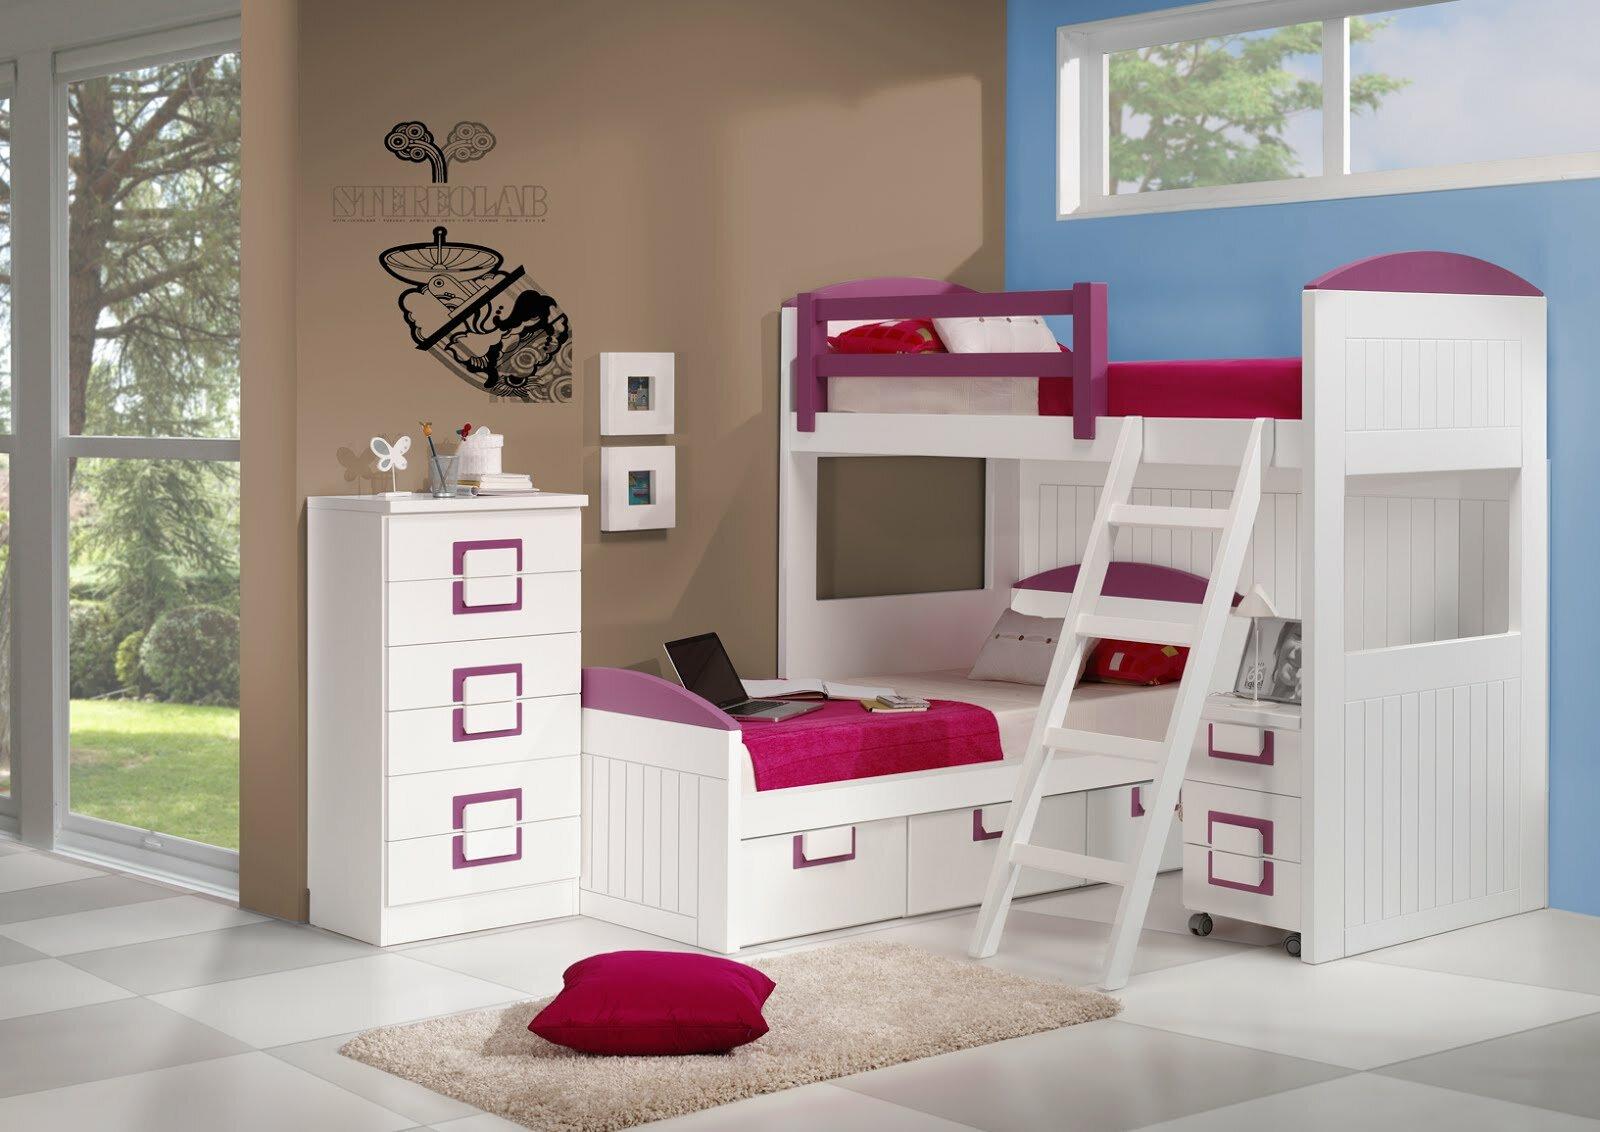 22 inspiring kids bedroom furniture designs for Dormitorios infantiles